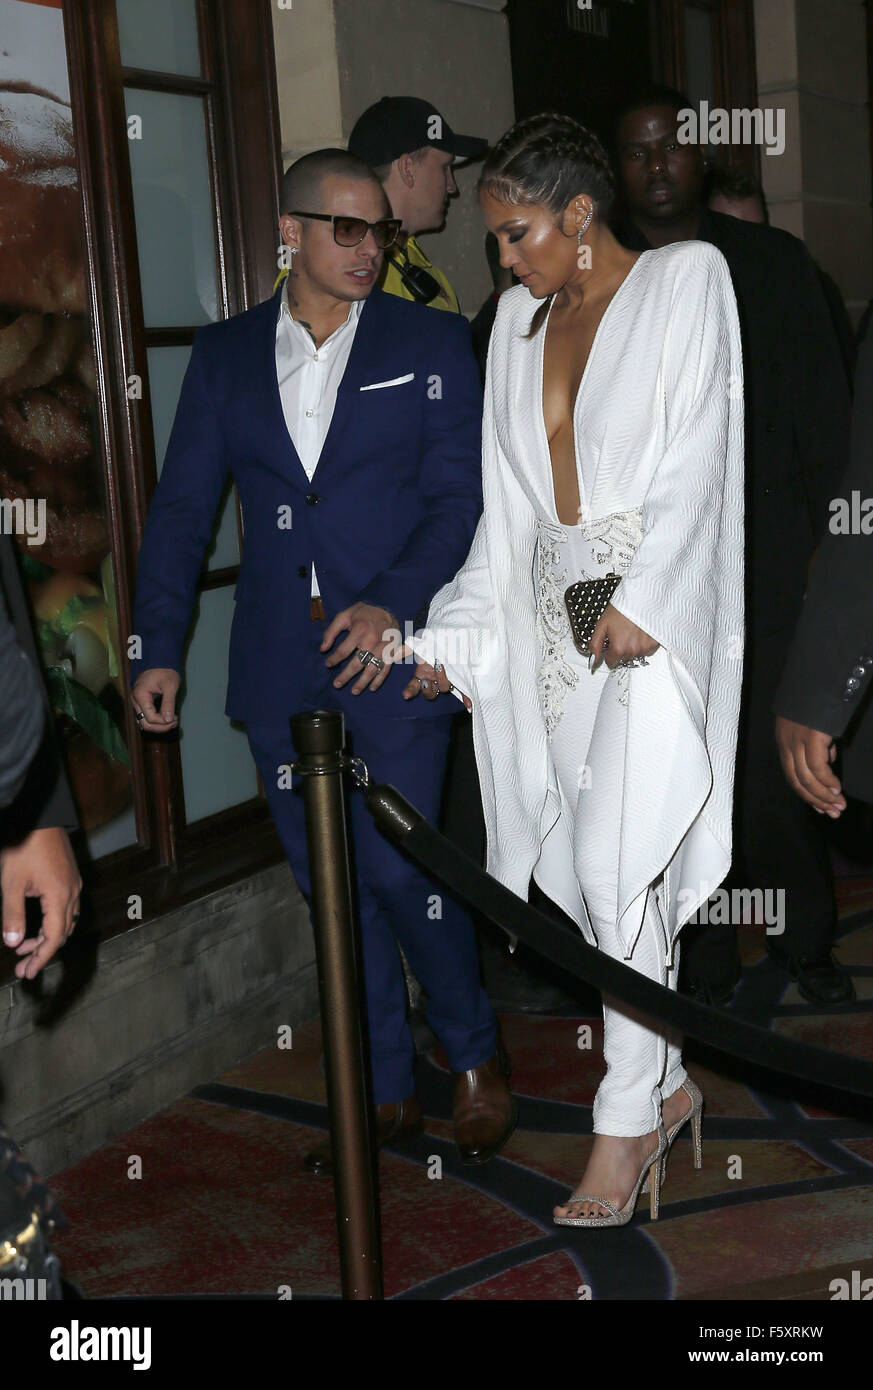 c21ba7a19502 Jennifer Lopez celebrates her Las Vegas Residency at Chateau Nightclub    Rooftop at Paris Las Vegas Featuring  Jennifer Lopez